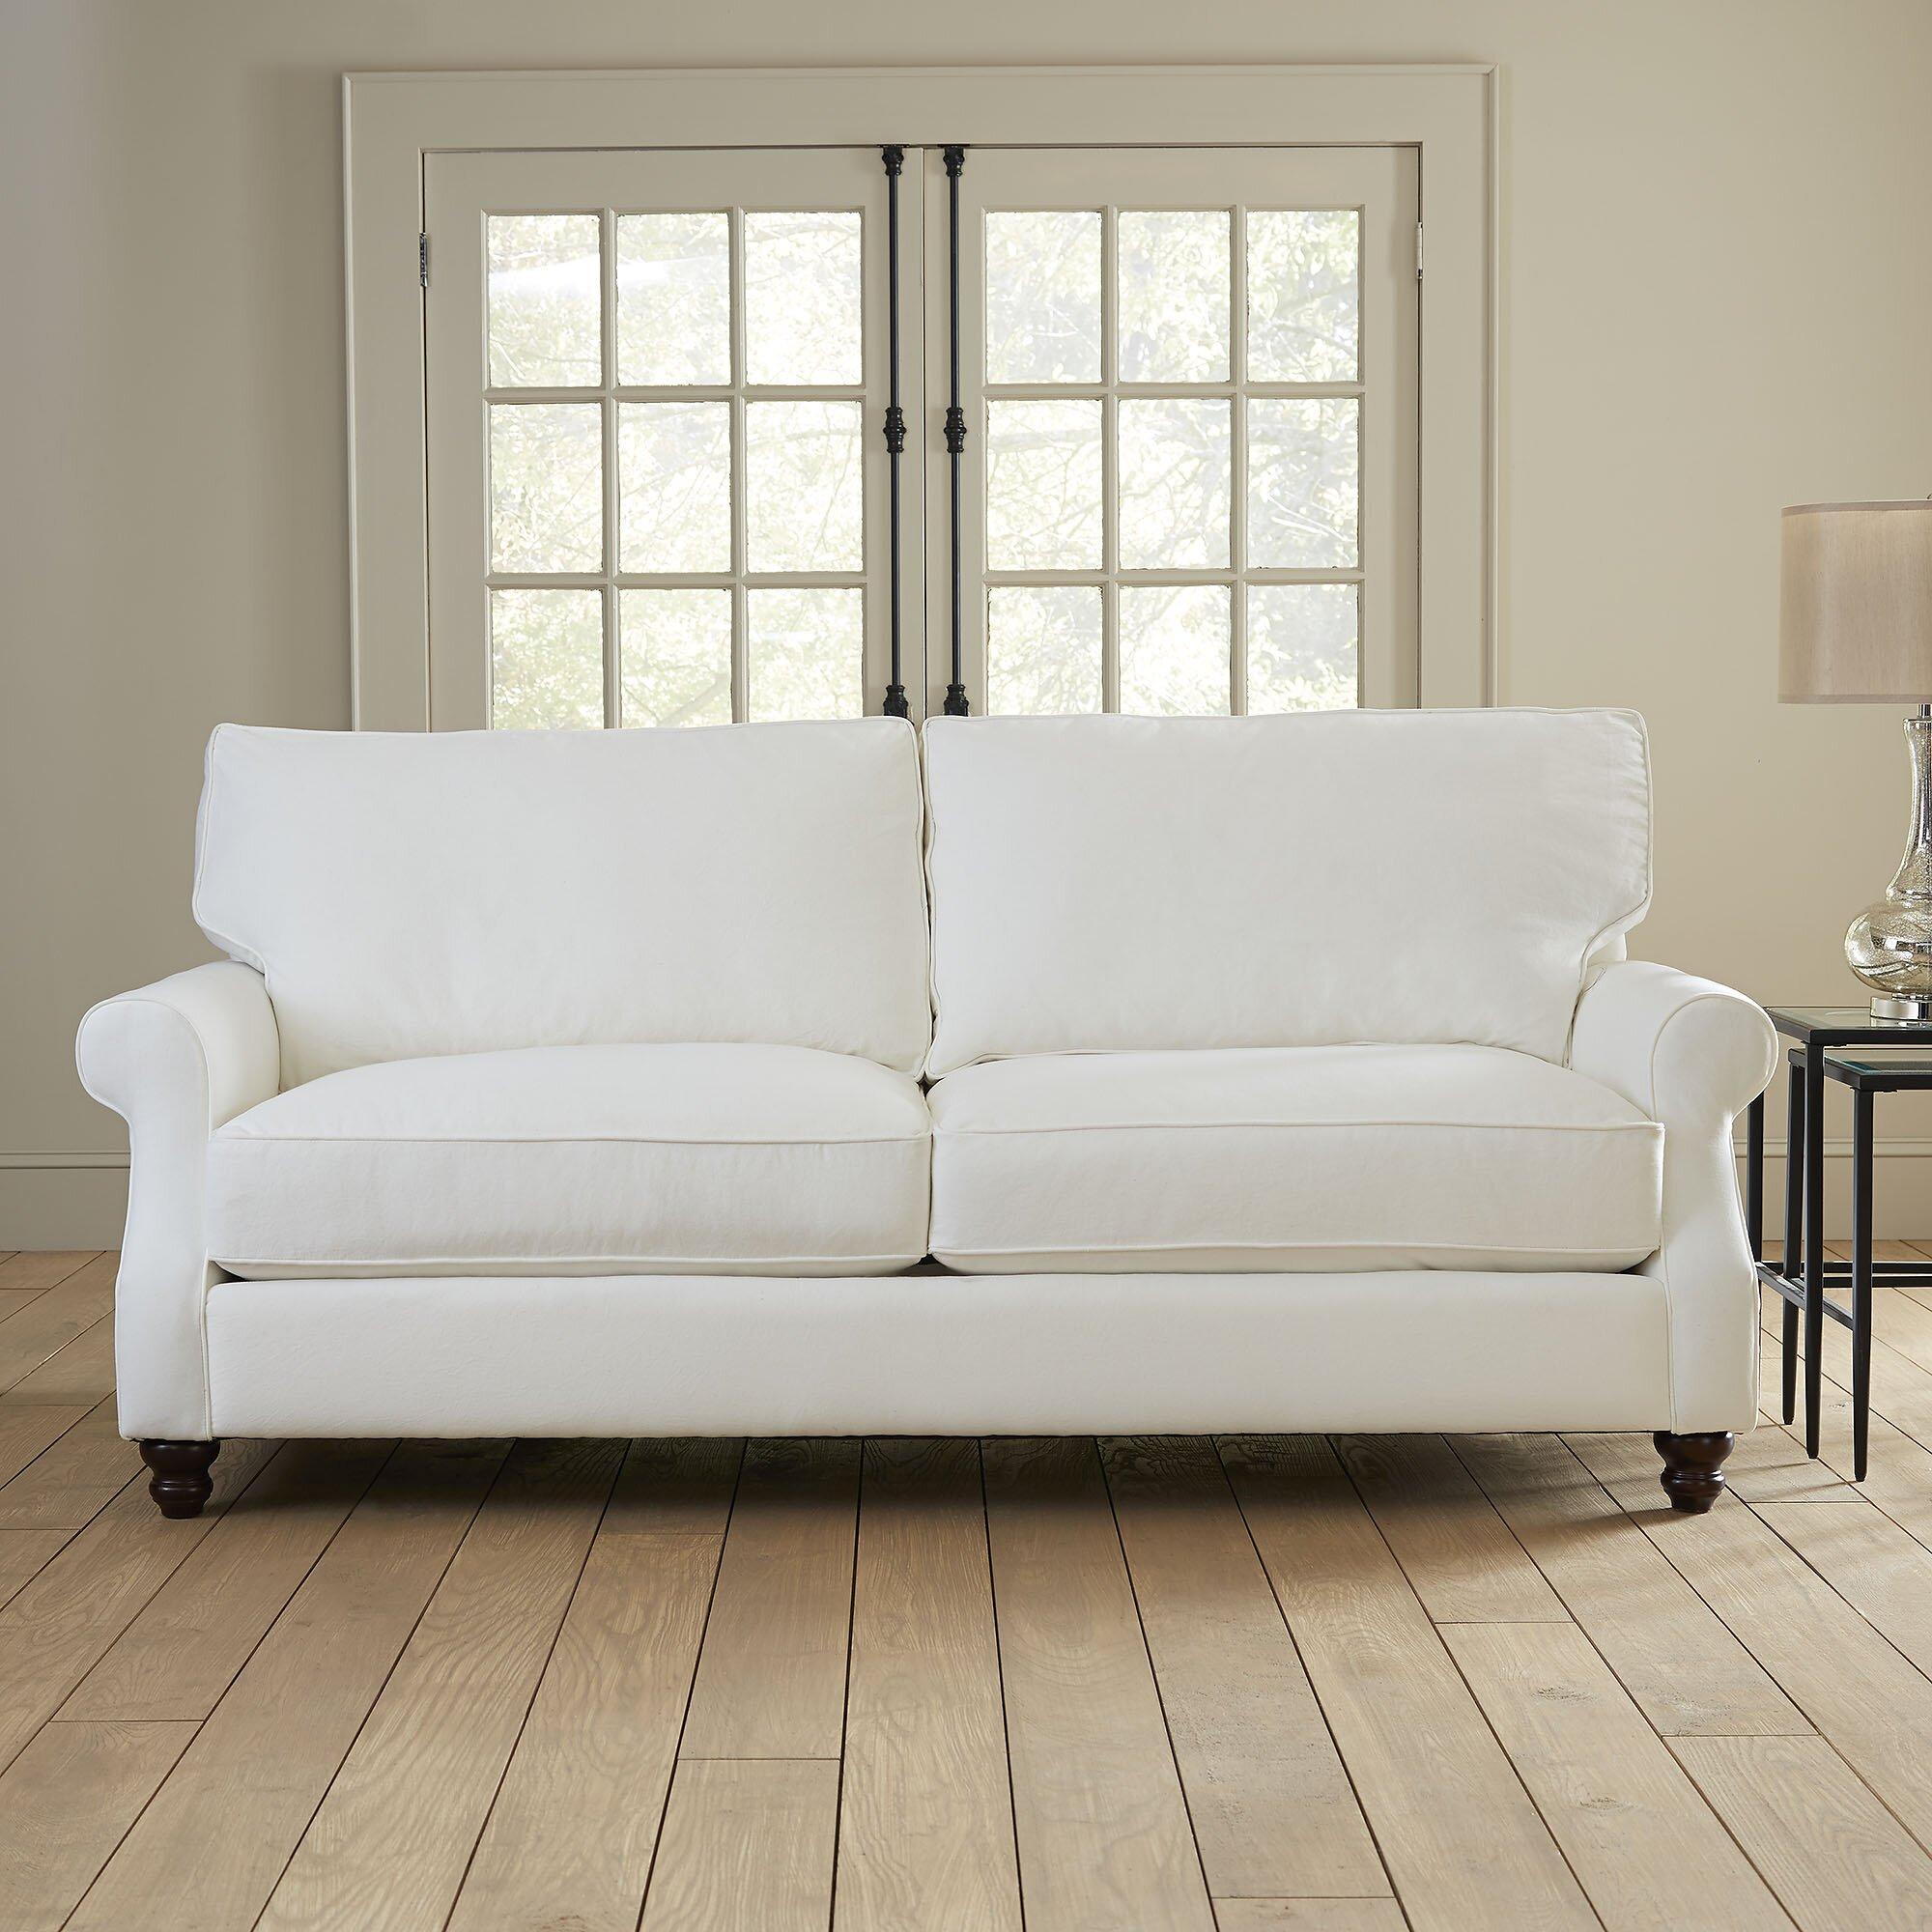 lane bowden sofa Sofa Hpricot